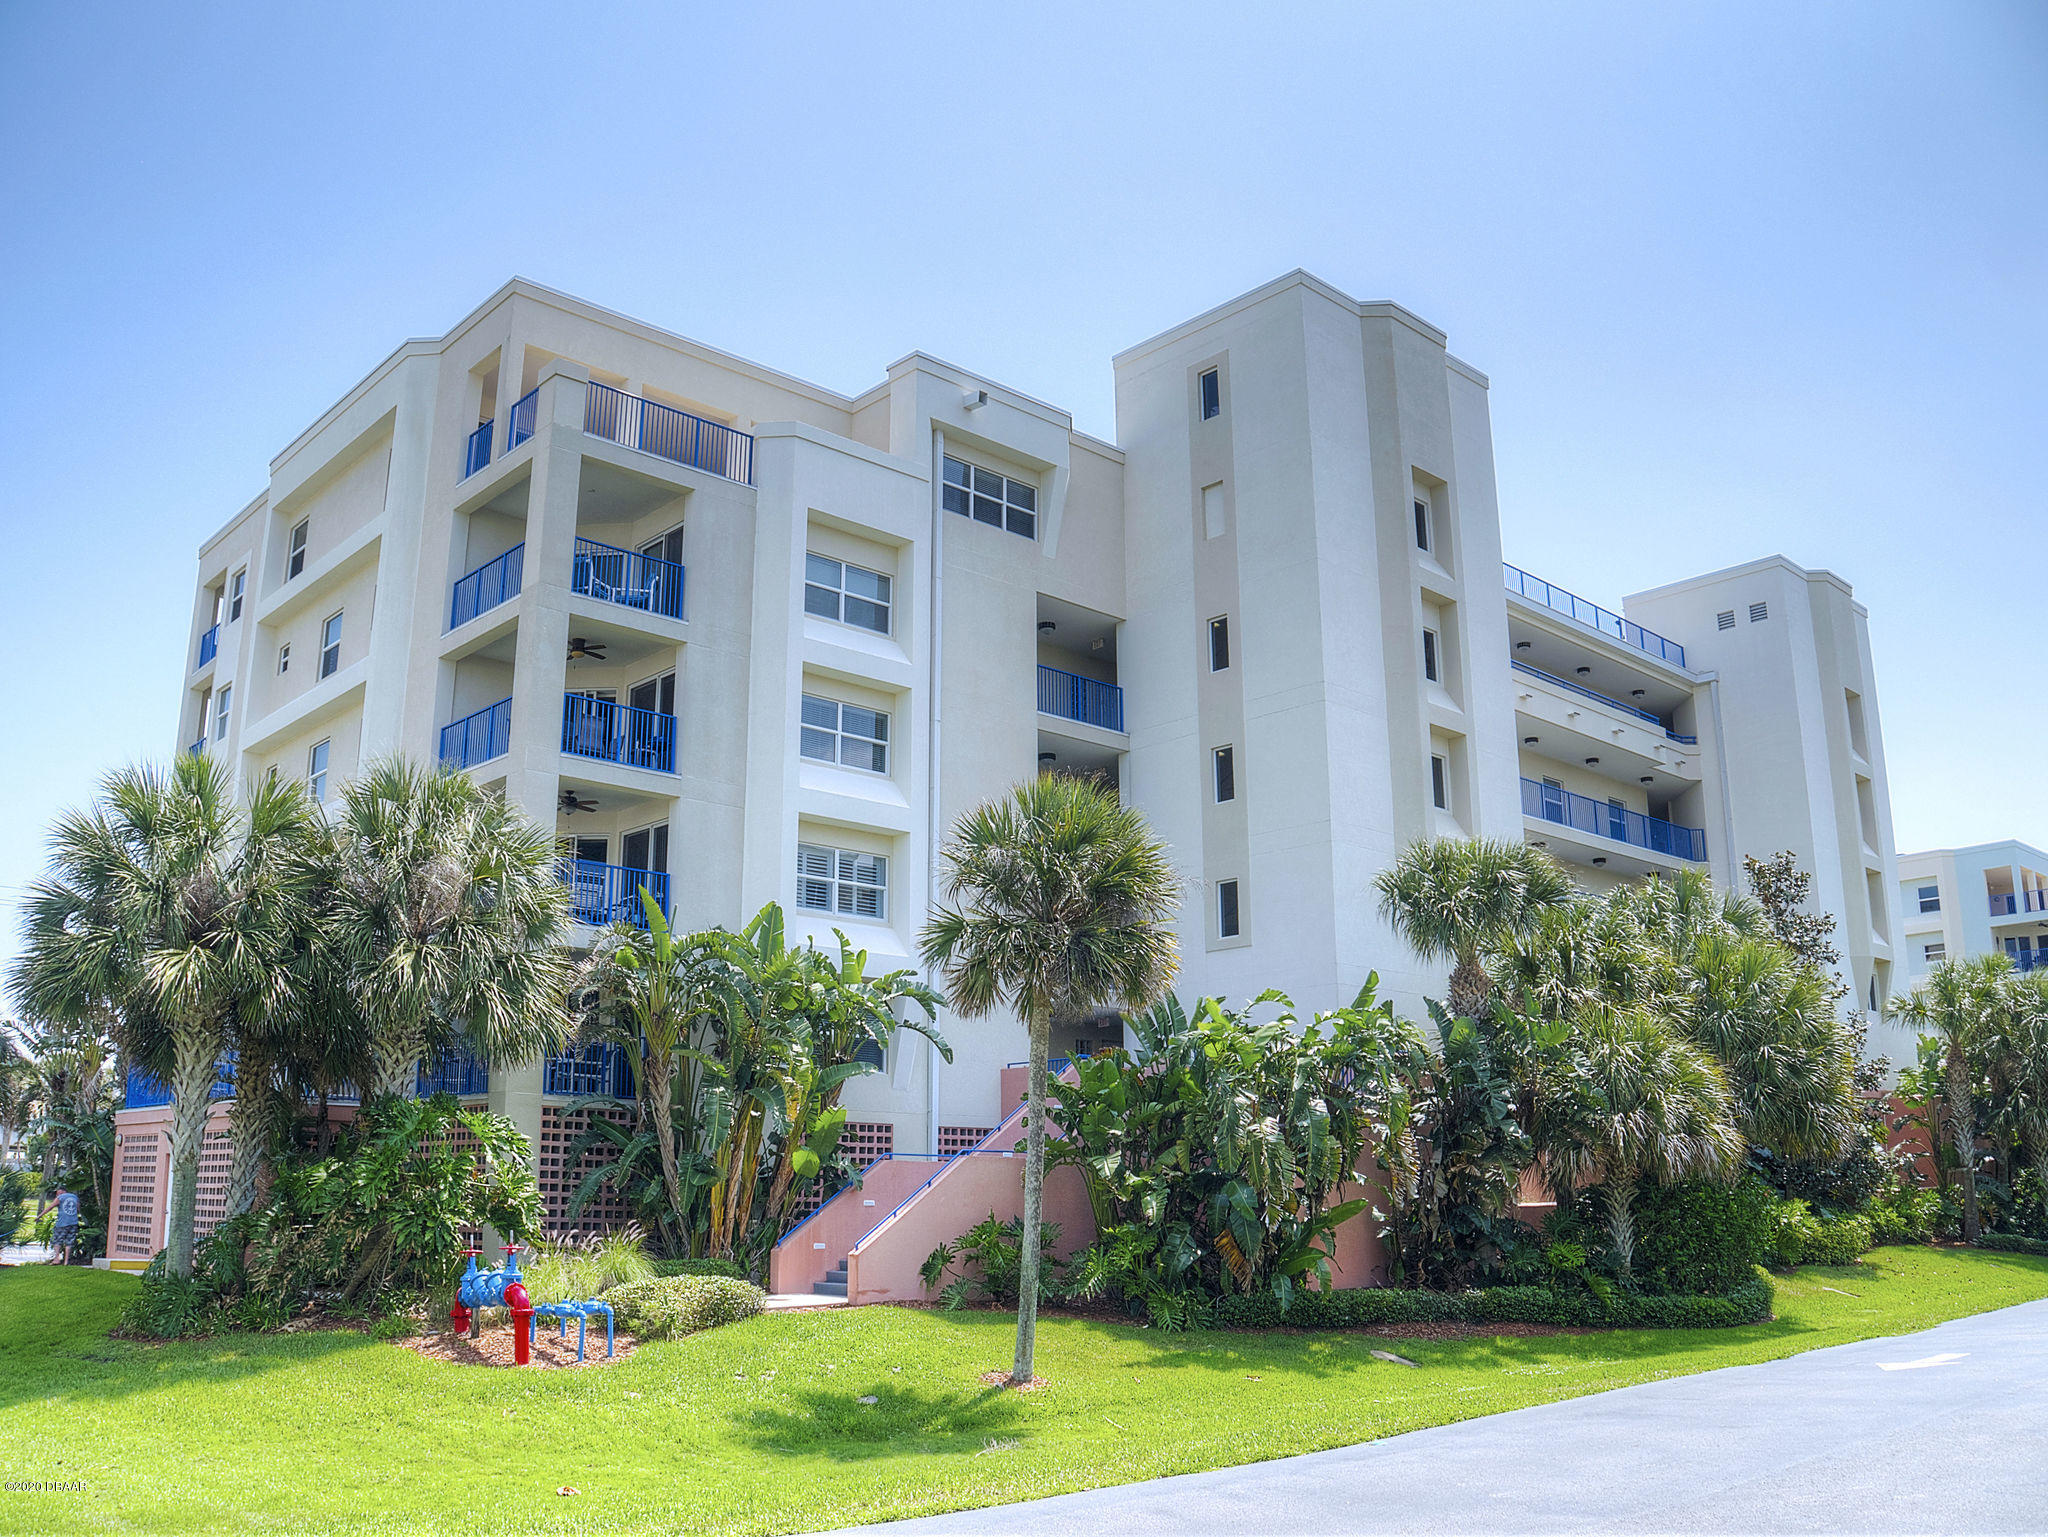 Photo of 5300 S Atlantic Avenue #12206, New Smyrna Beach, FL 32169